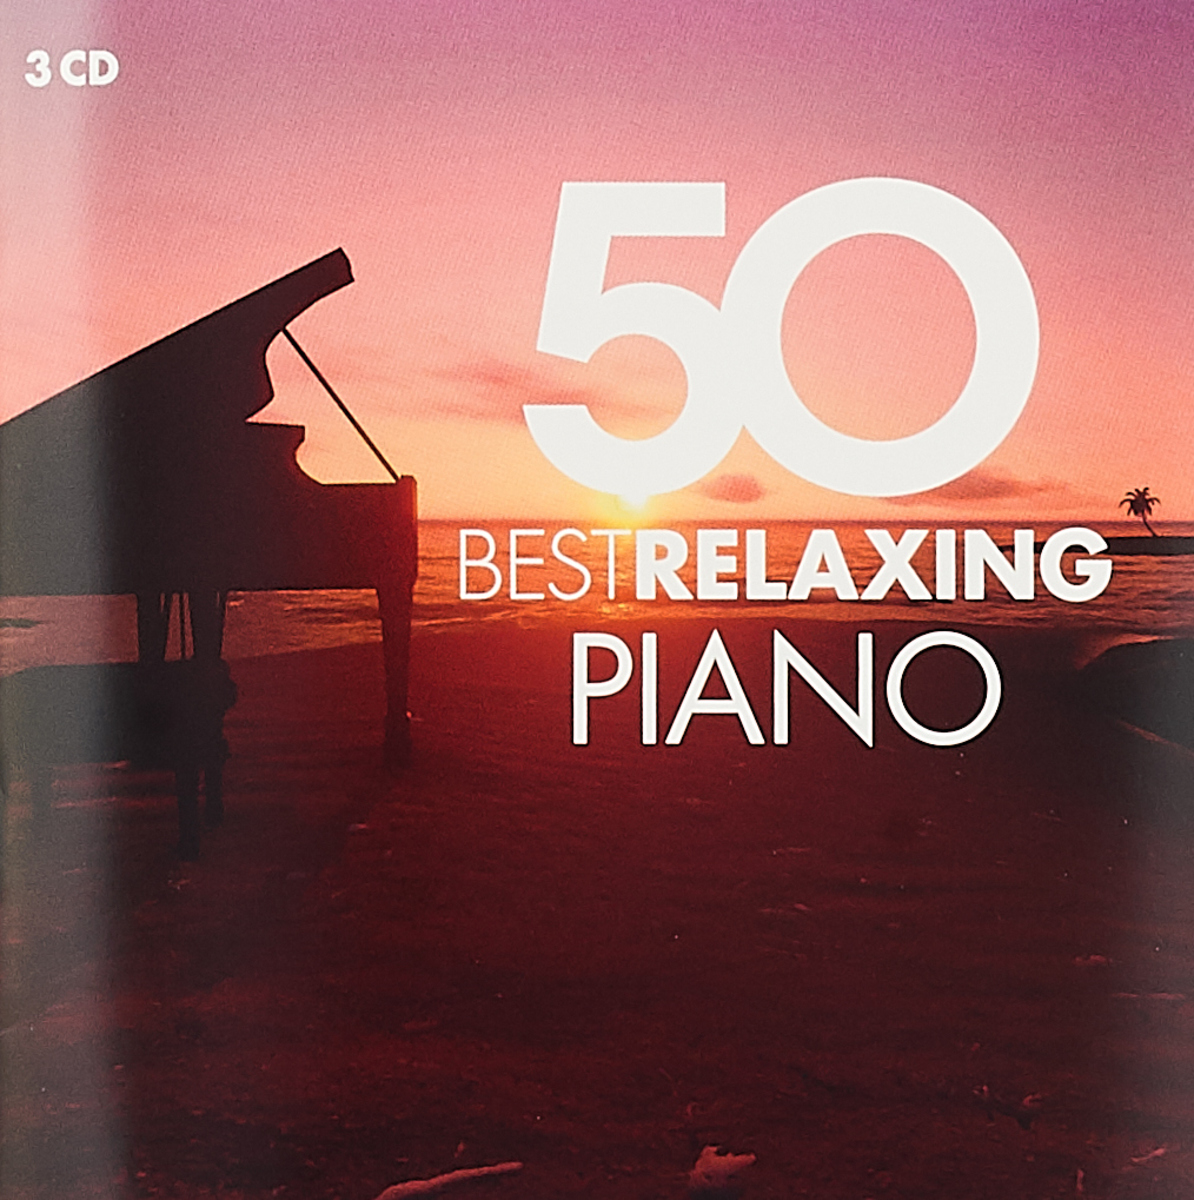 Various Artists 50 Best Relaxing Piano (3 CD) various artists romantic piano adagios 2 cd